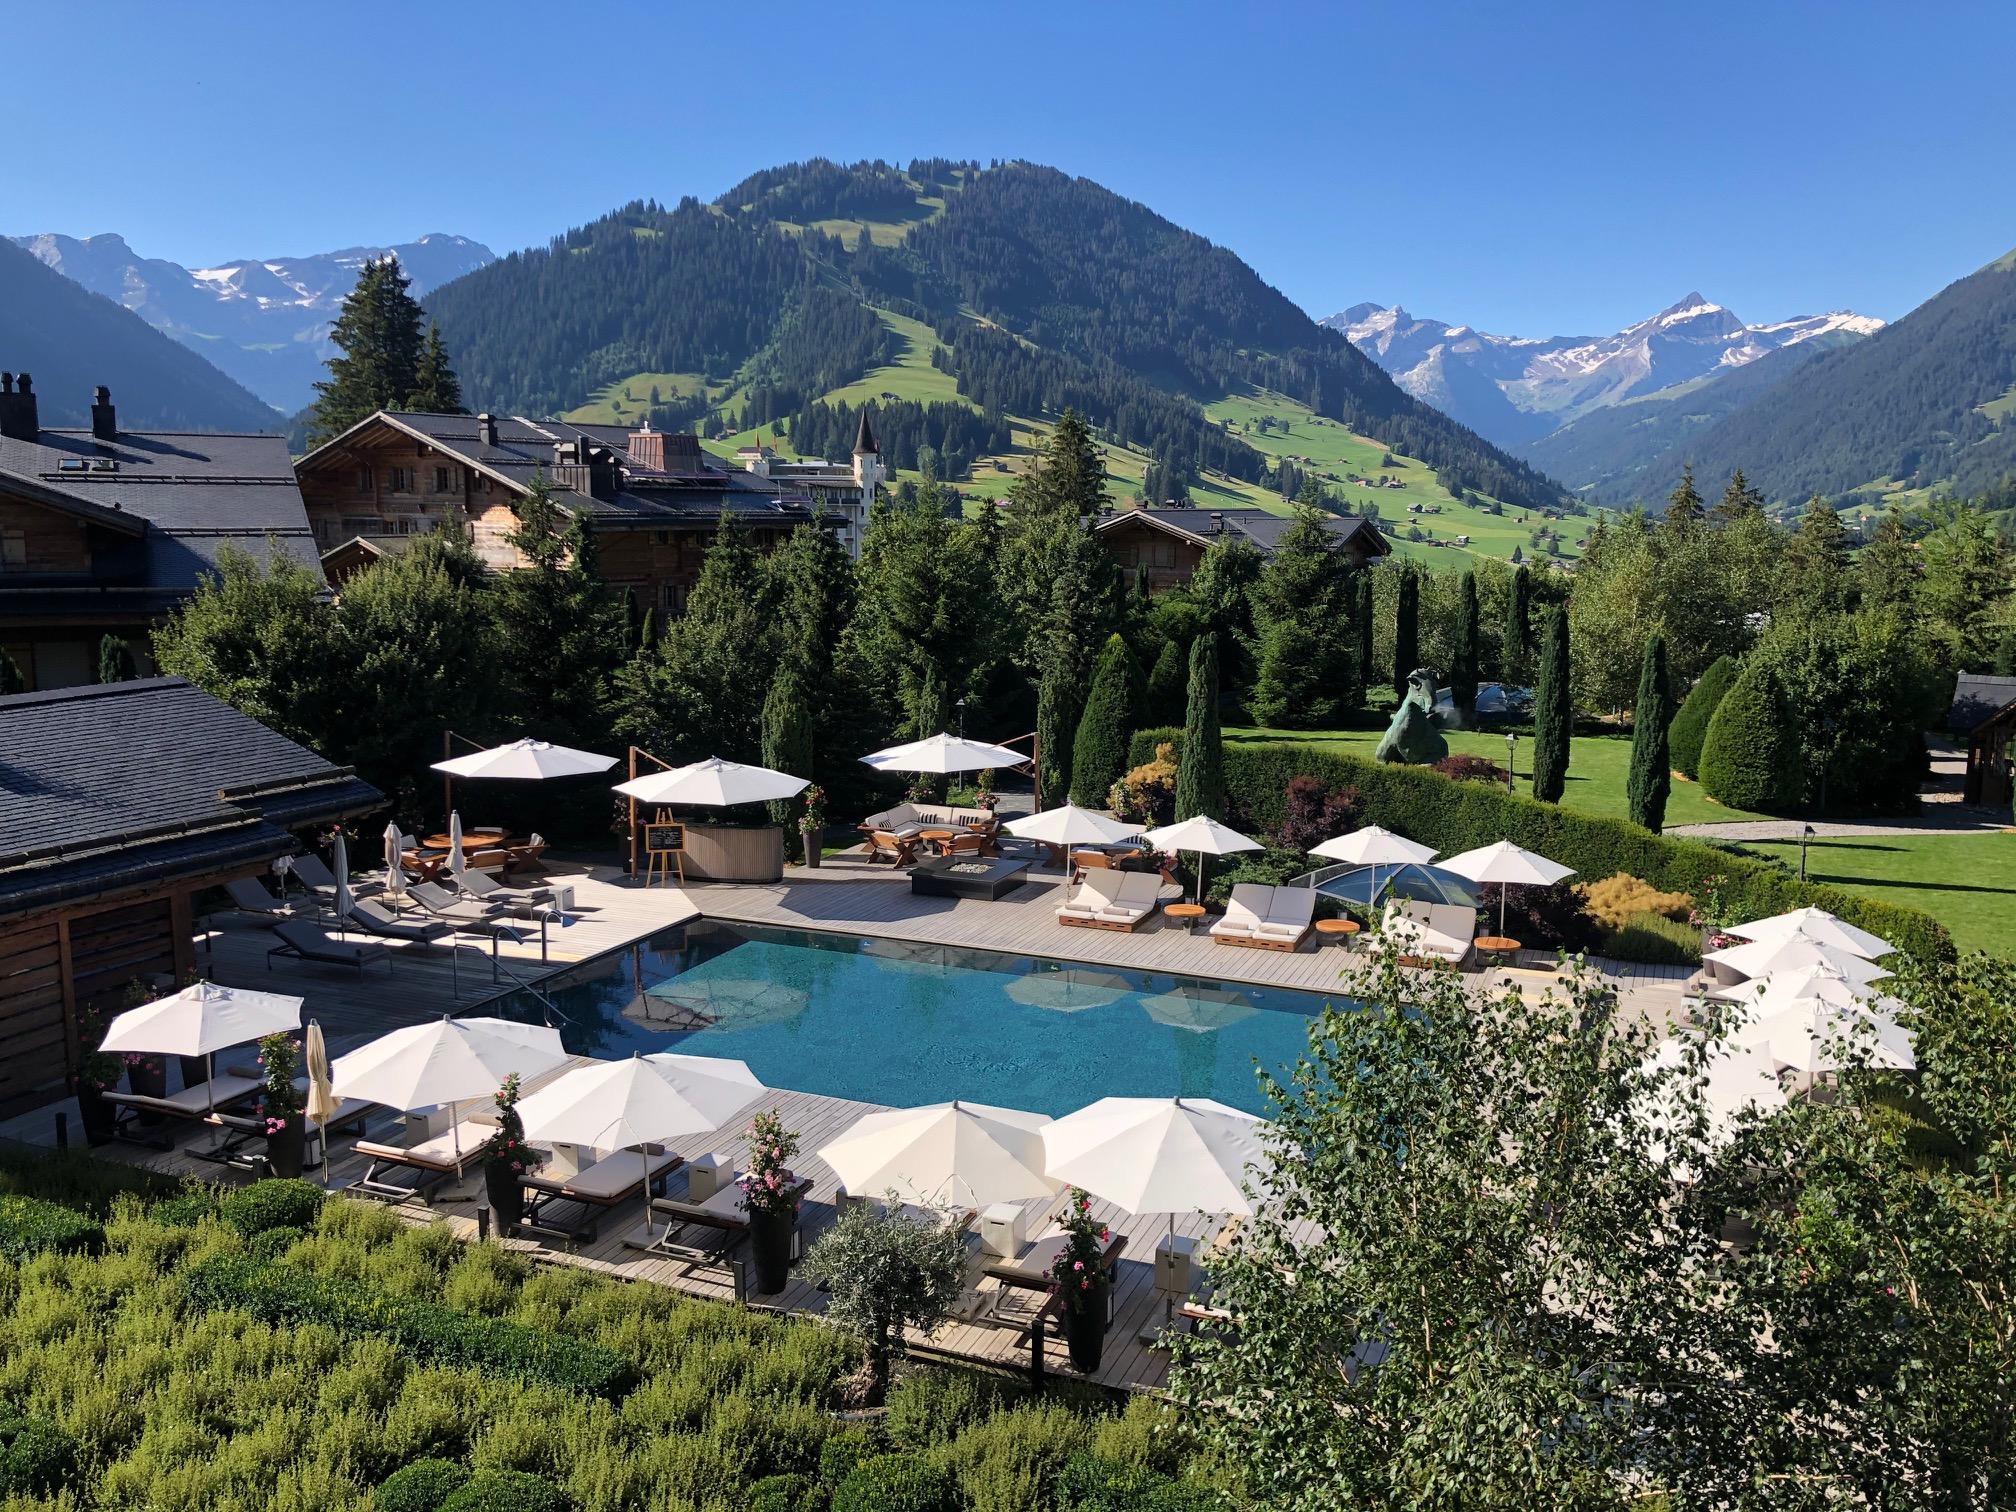 thea Alpina Gstaad Aussicht auf Aussenpool